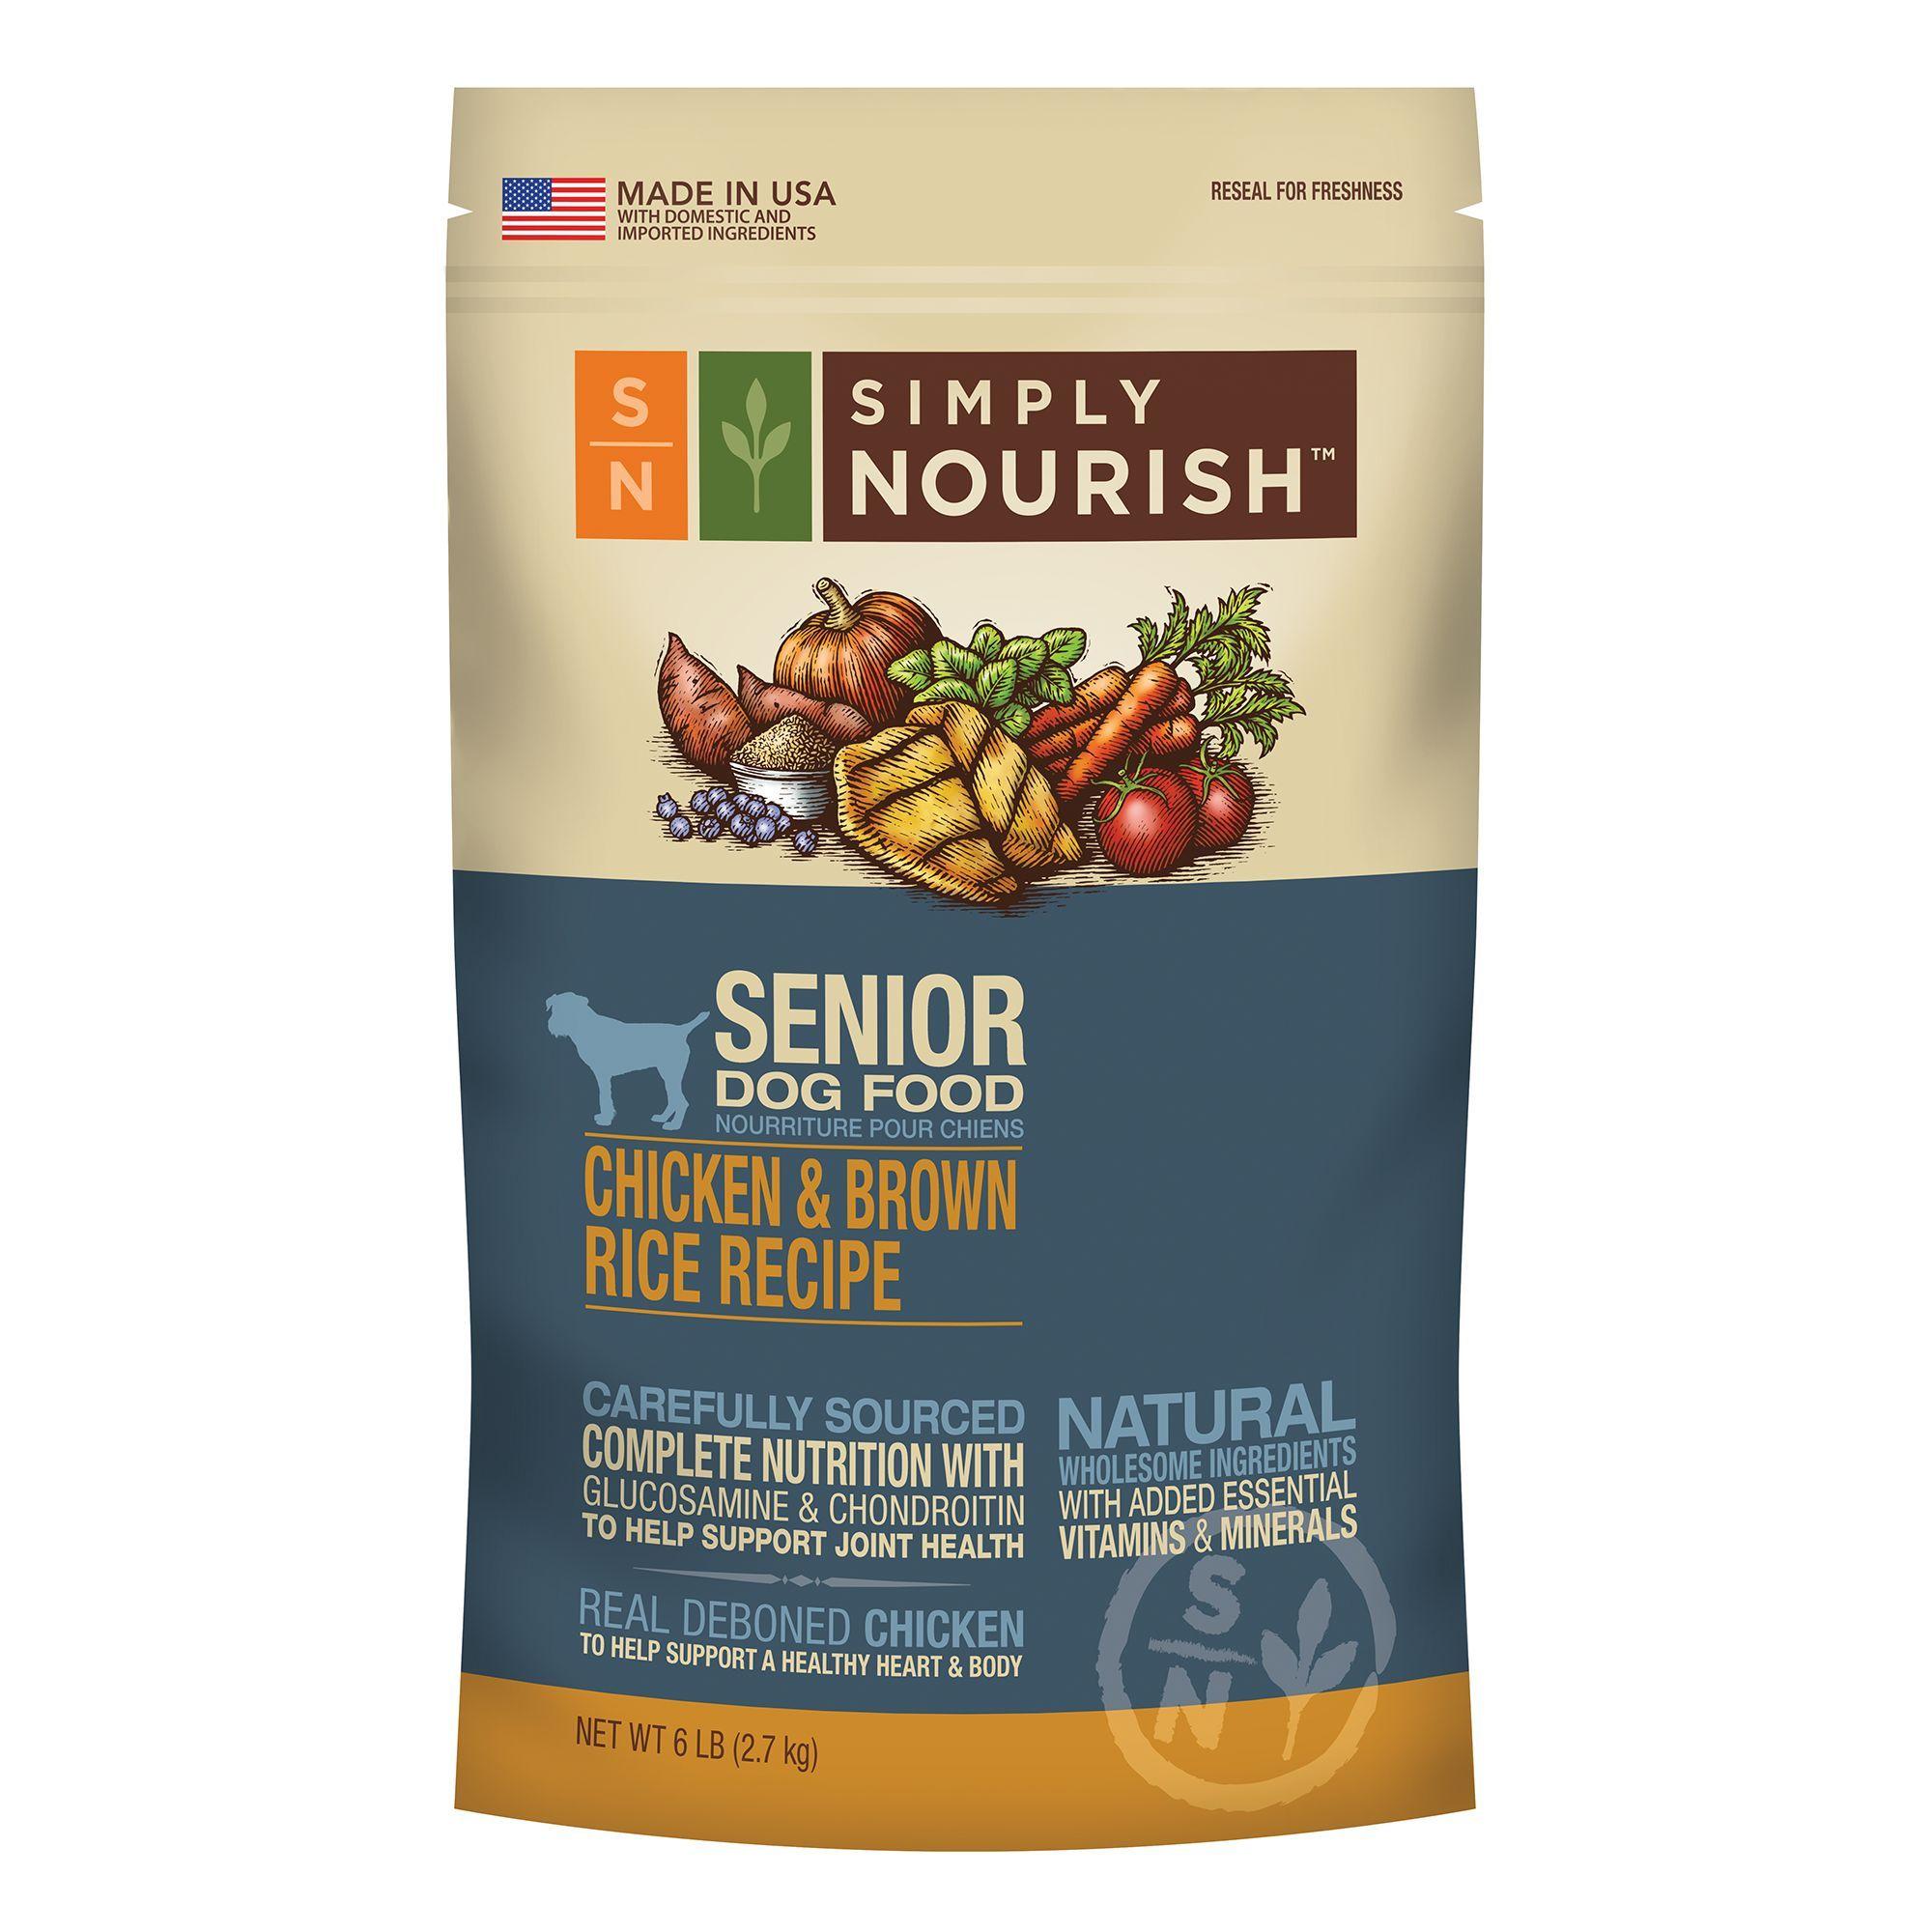 Simply Nourish Senior Dog Food Natural Chicken And Brown Rice